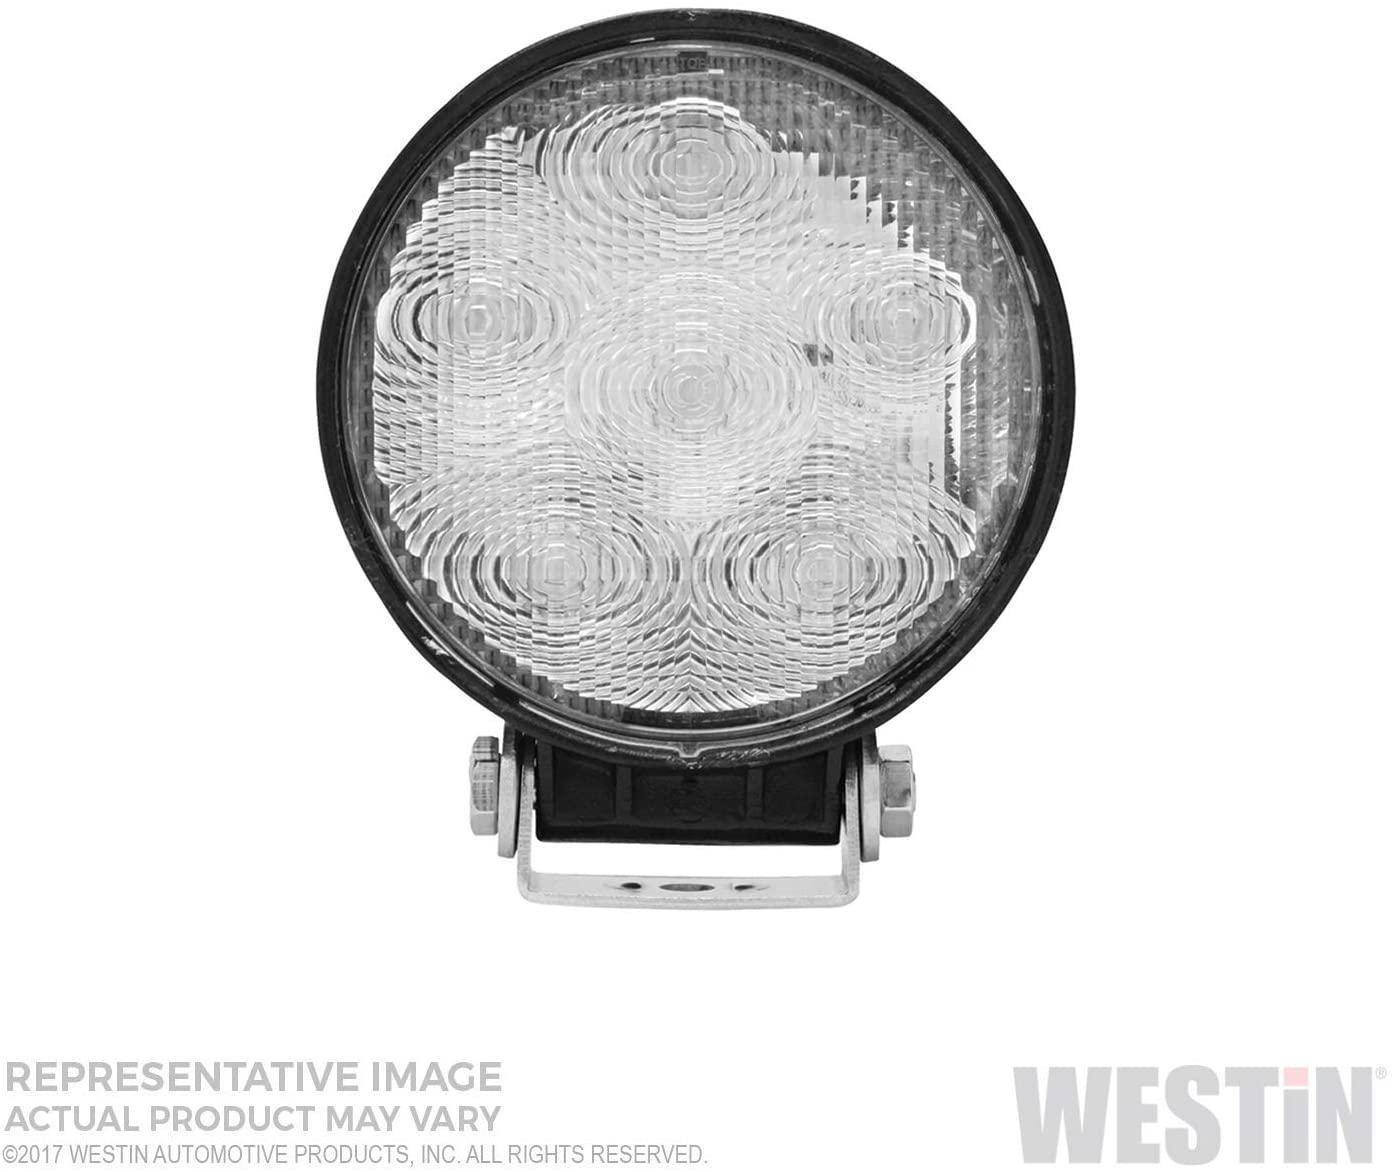 Westin 09-12005A LED Work Light